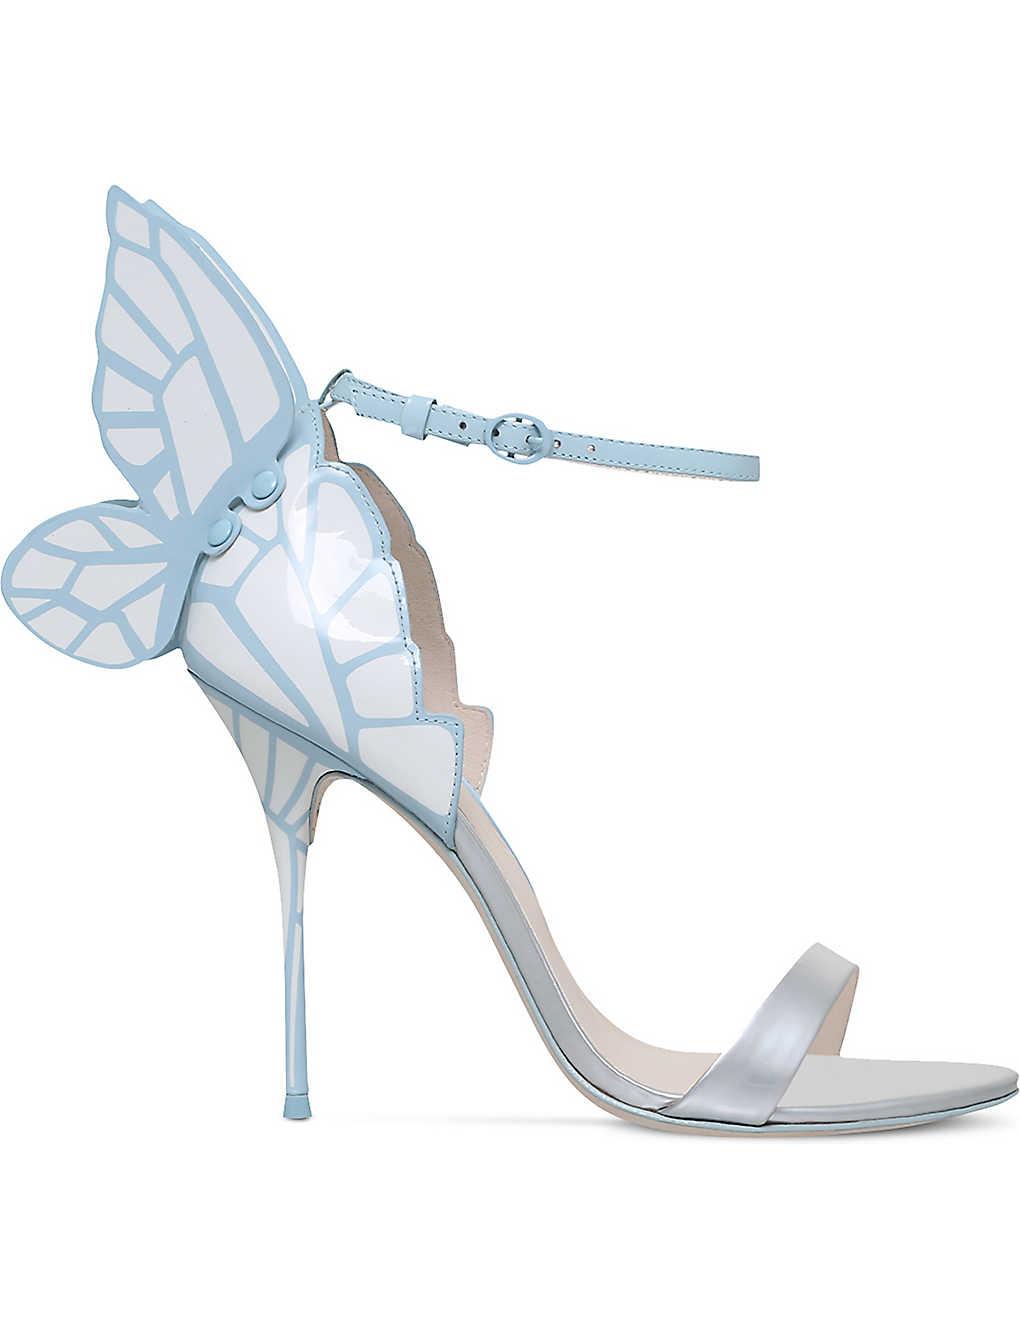 b3bdd805c28d SOPHIA WEBSTER - Chiara bridal winged leather sandals